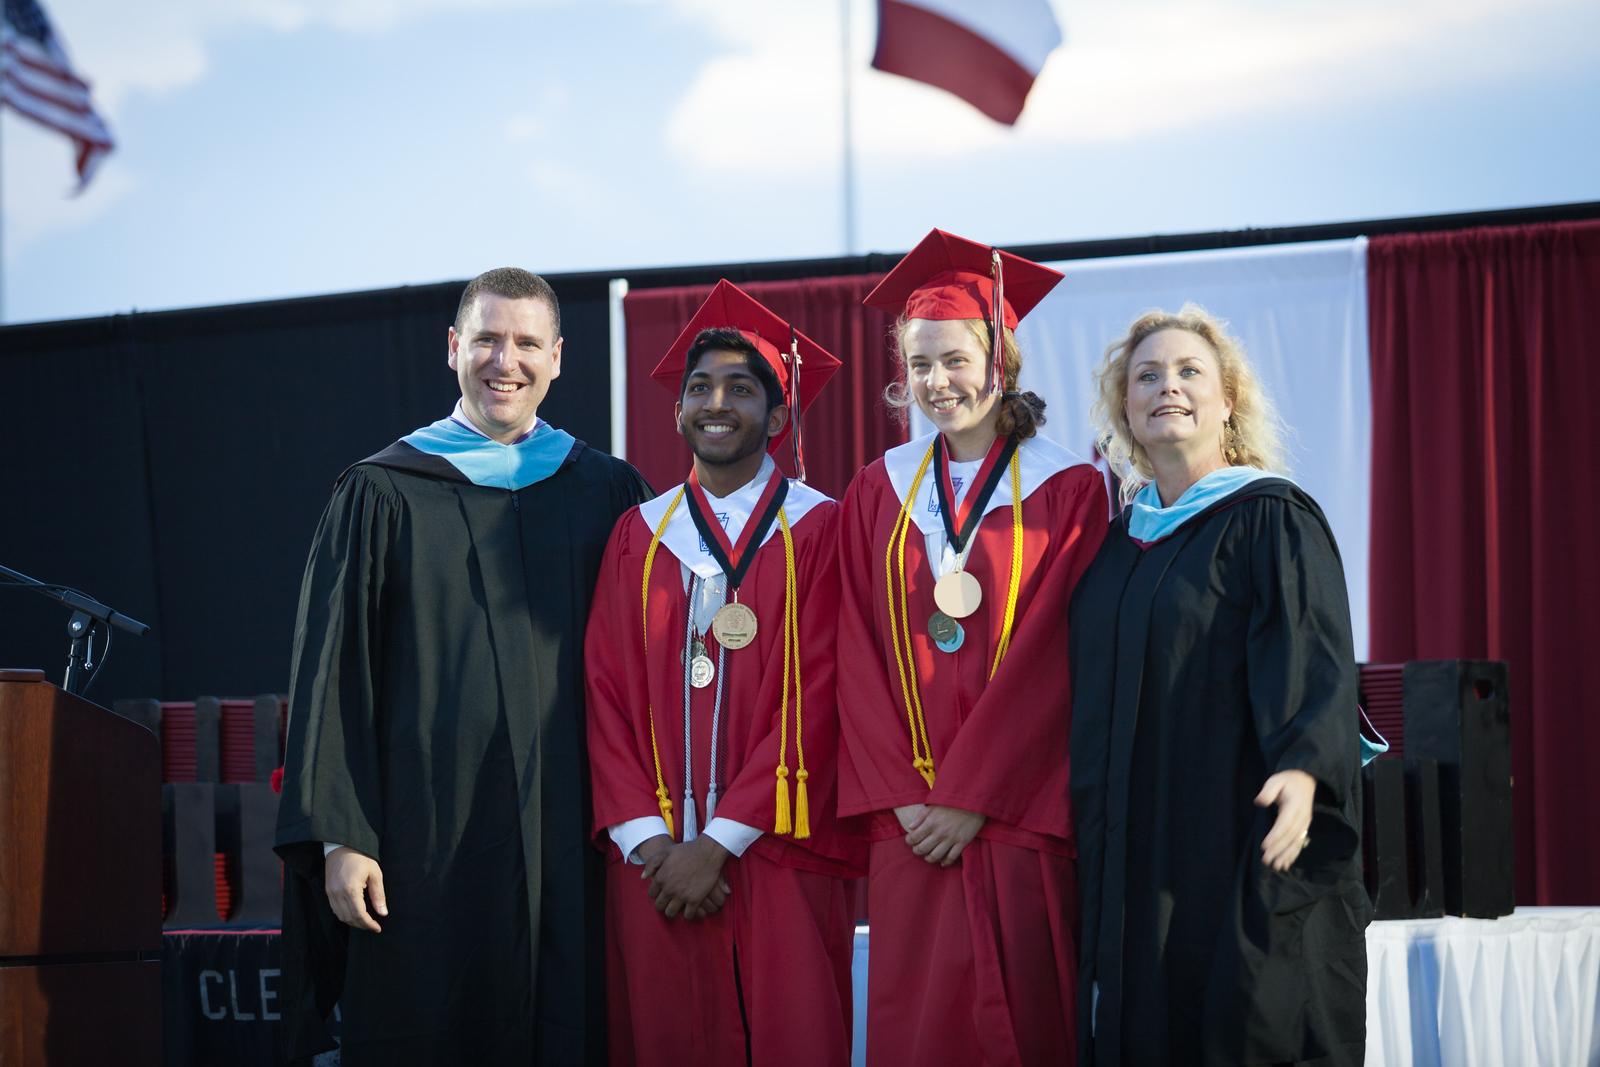 Clear Brook High School Class of 2017